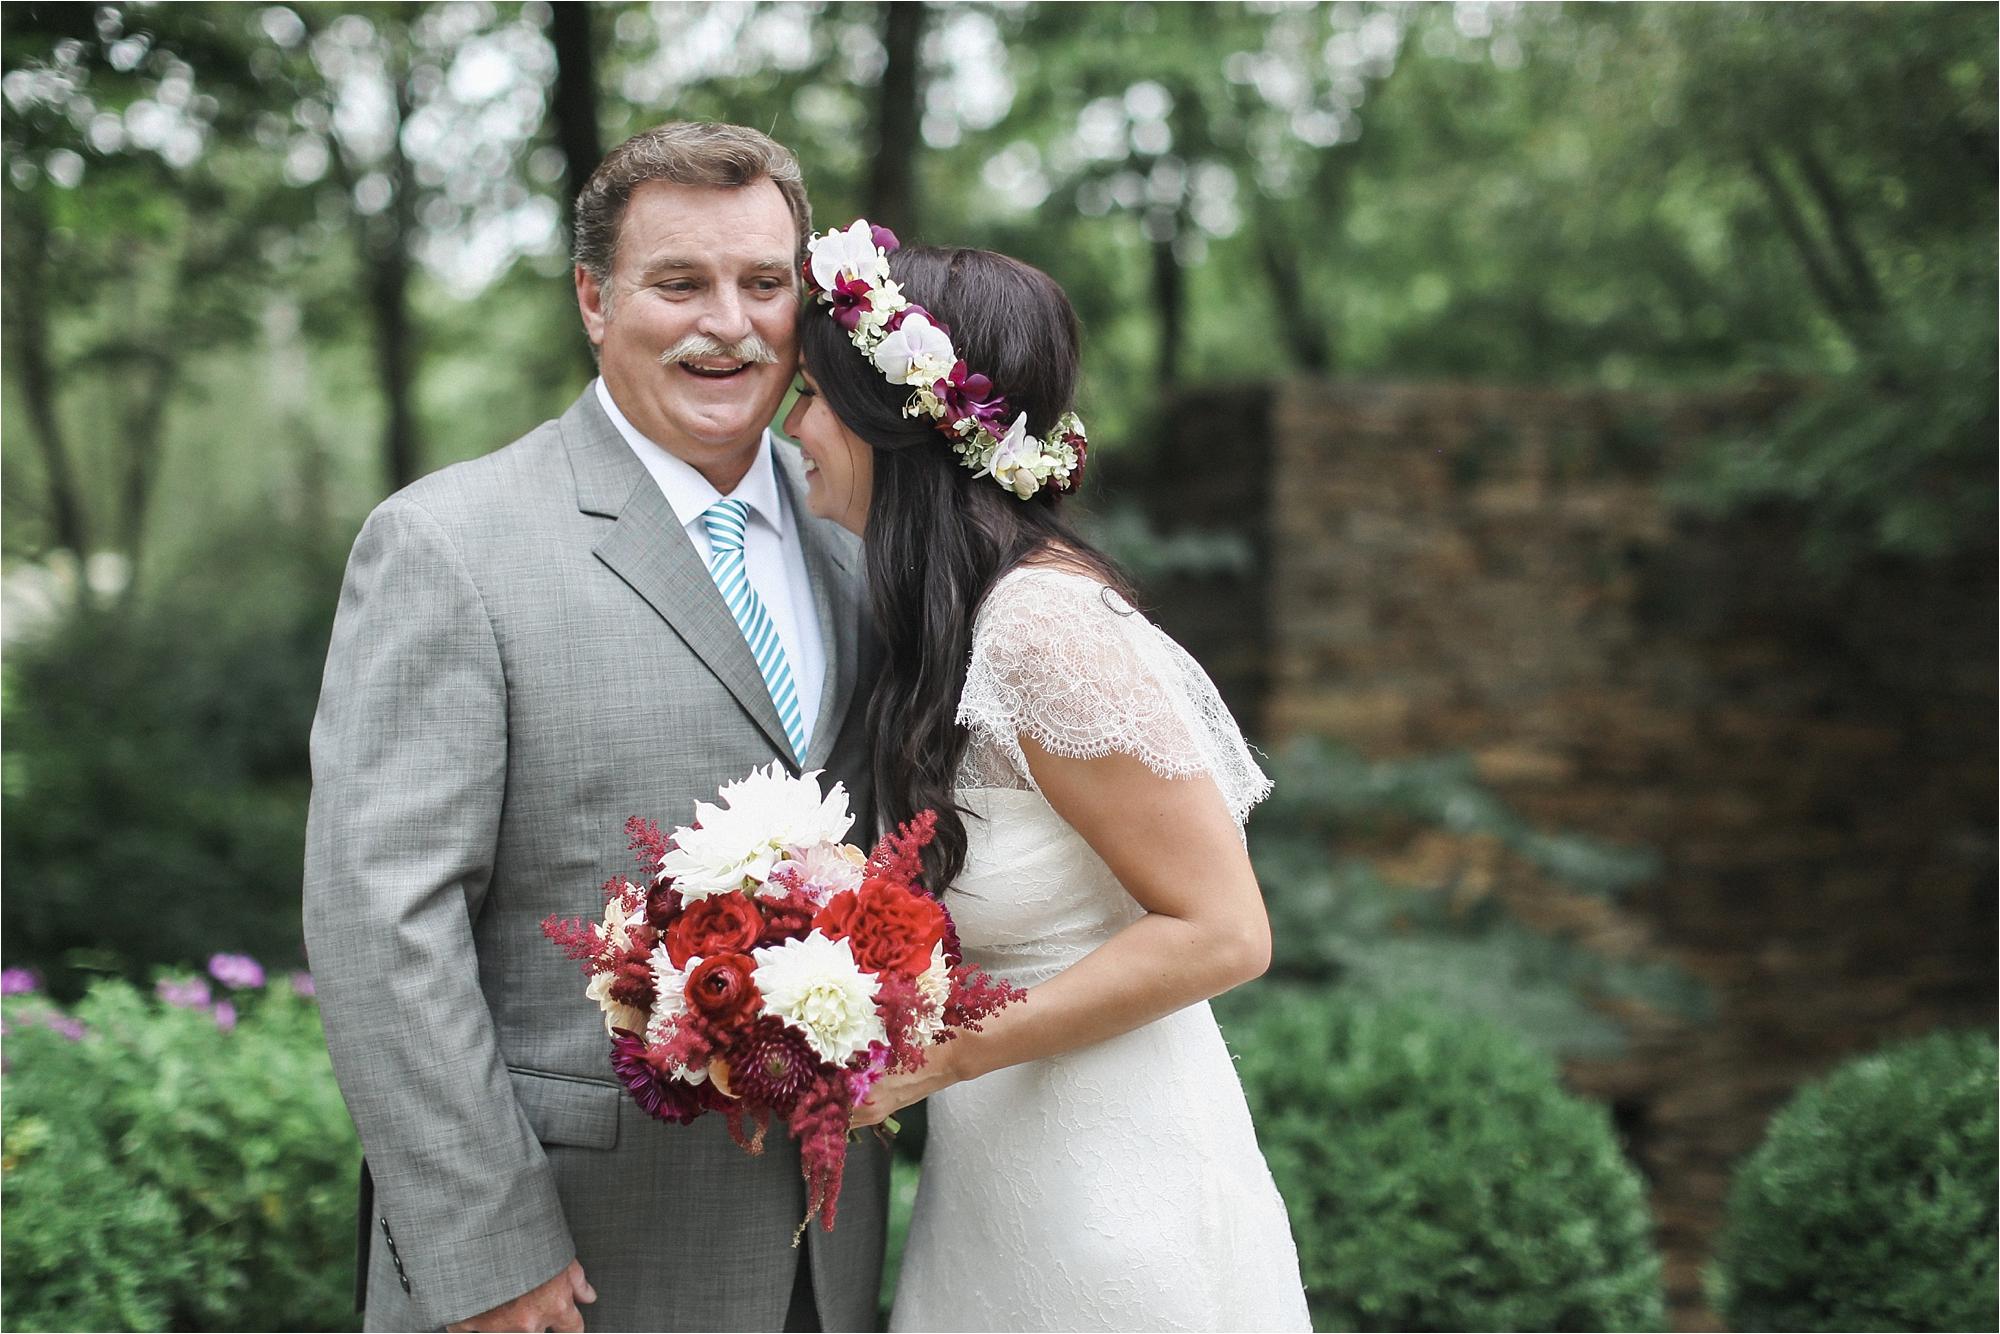 stephanie-yonce-photography-richmond-virginia-bohemian-outdoor-wedding-photo_0021.jpg